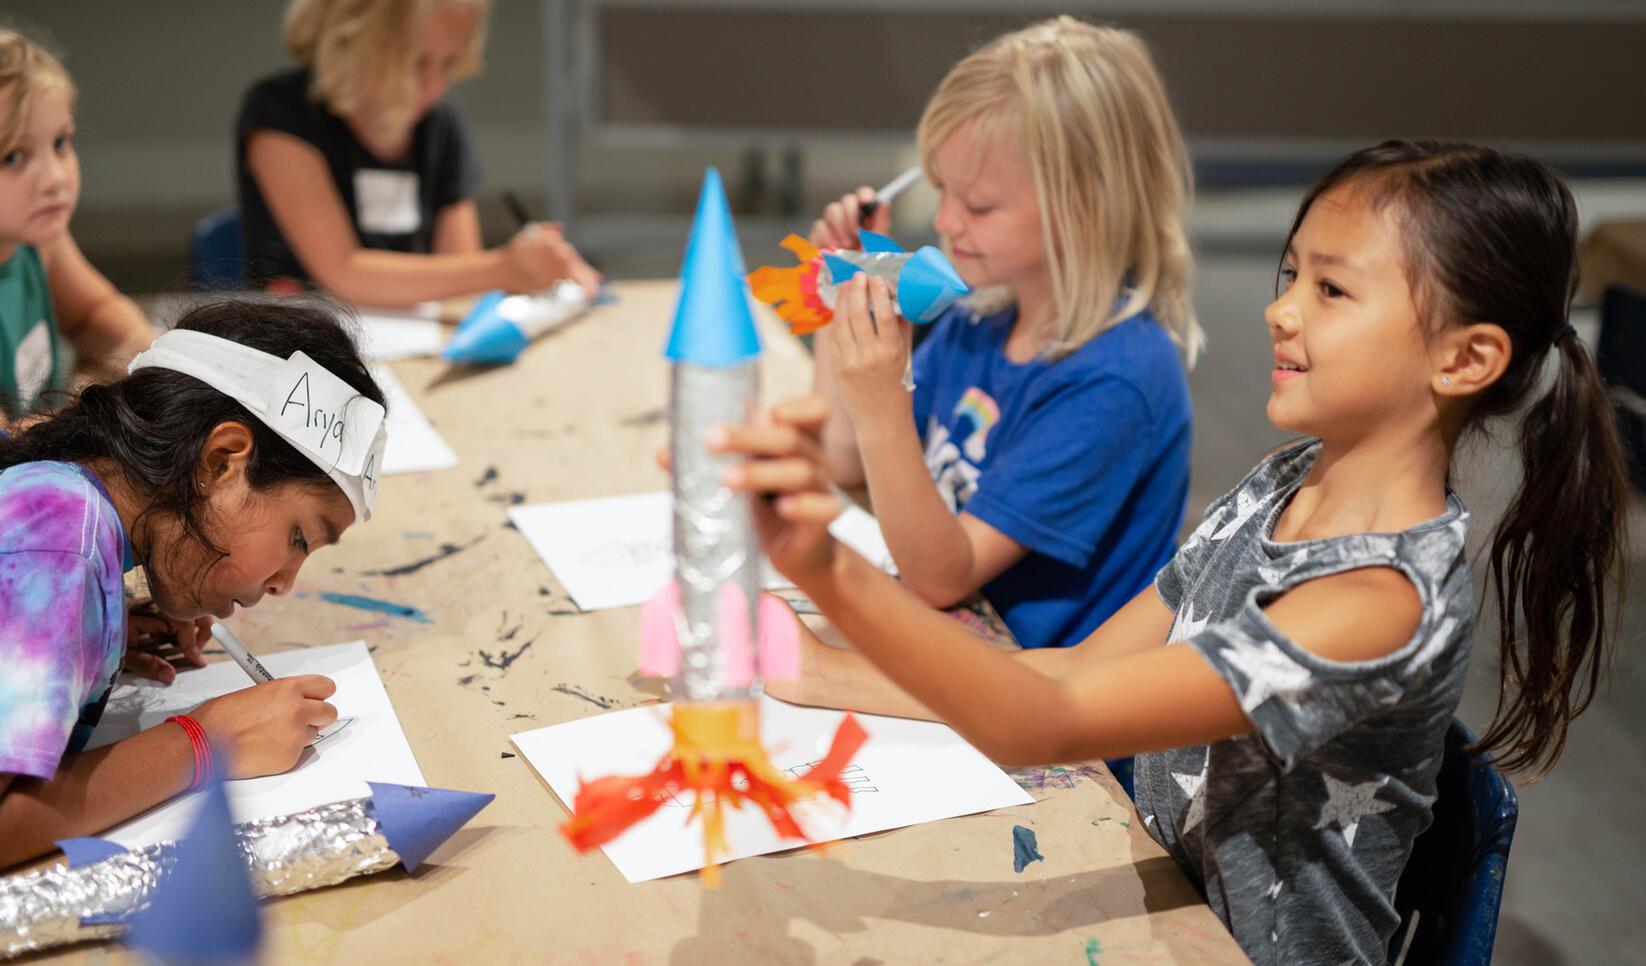 Students making rockets at Summer Youth Camps